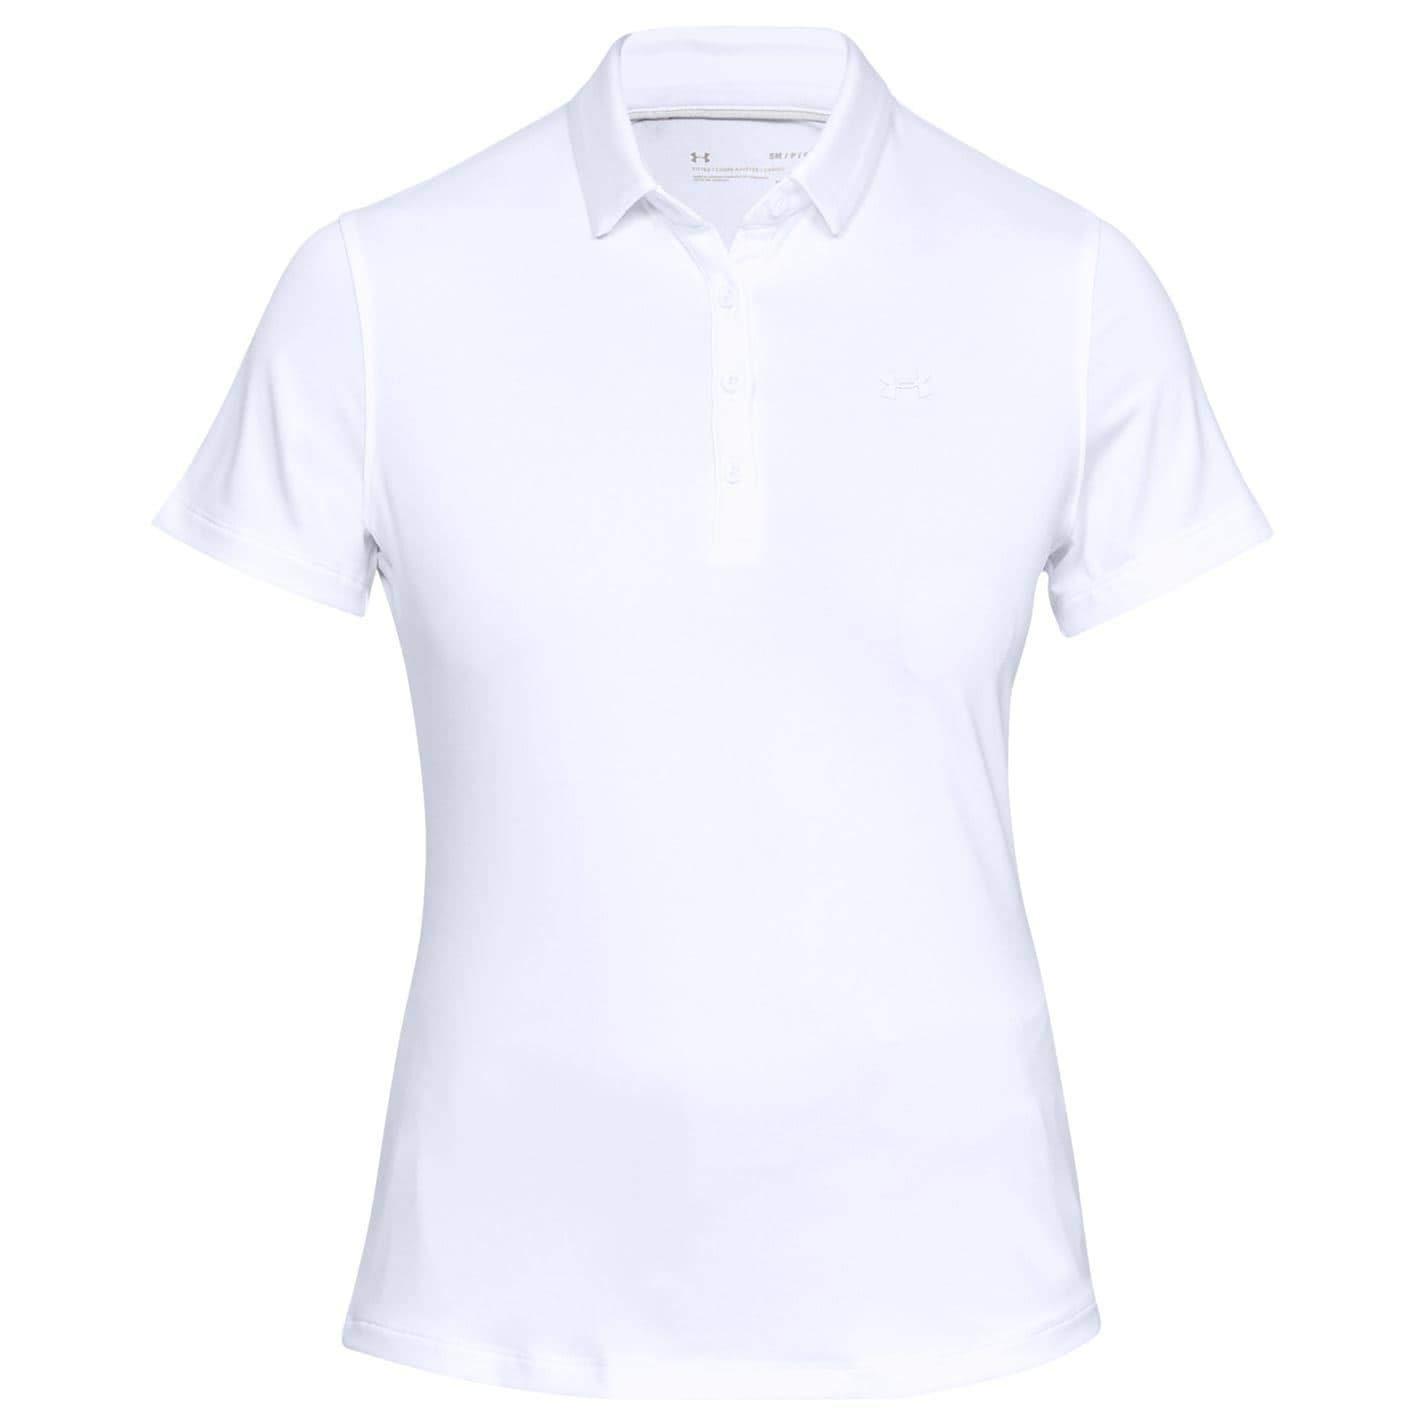 Under Armour Zinger Short Sleeve Polo - Polo Mujer: Amazon.es ...